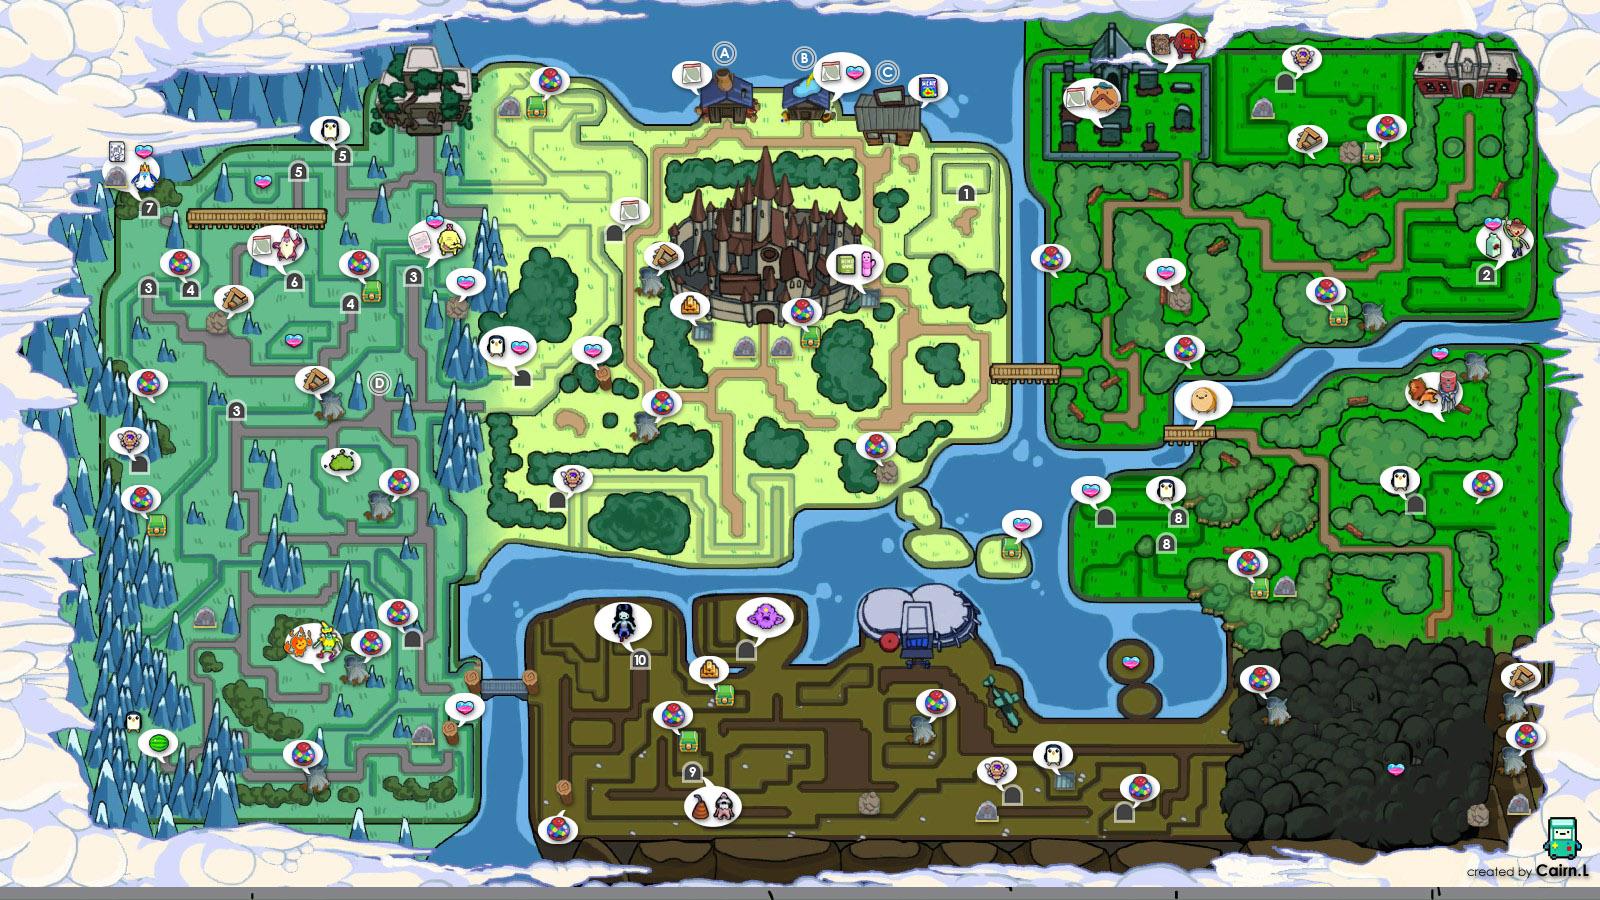 Steam Community Guide 100 Achievements Guide